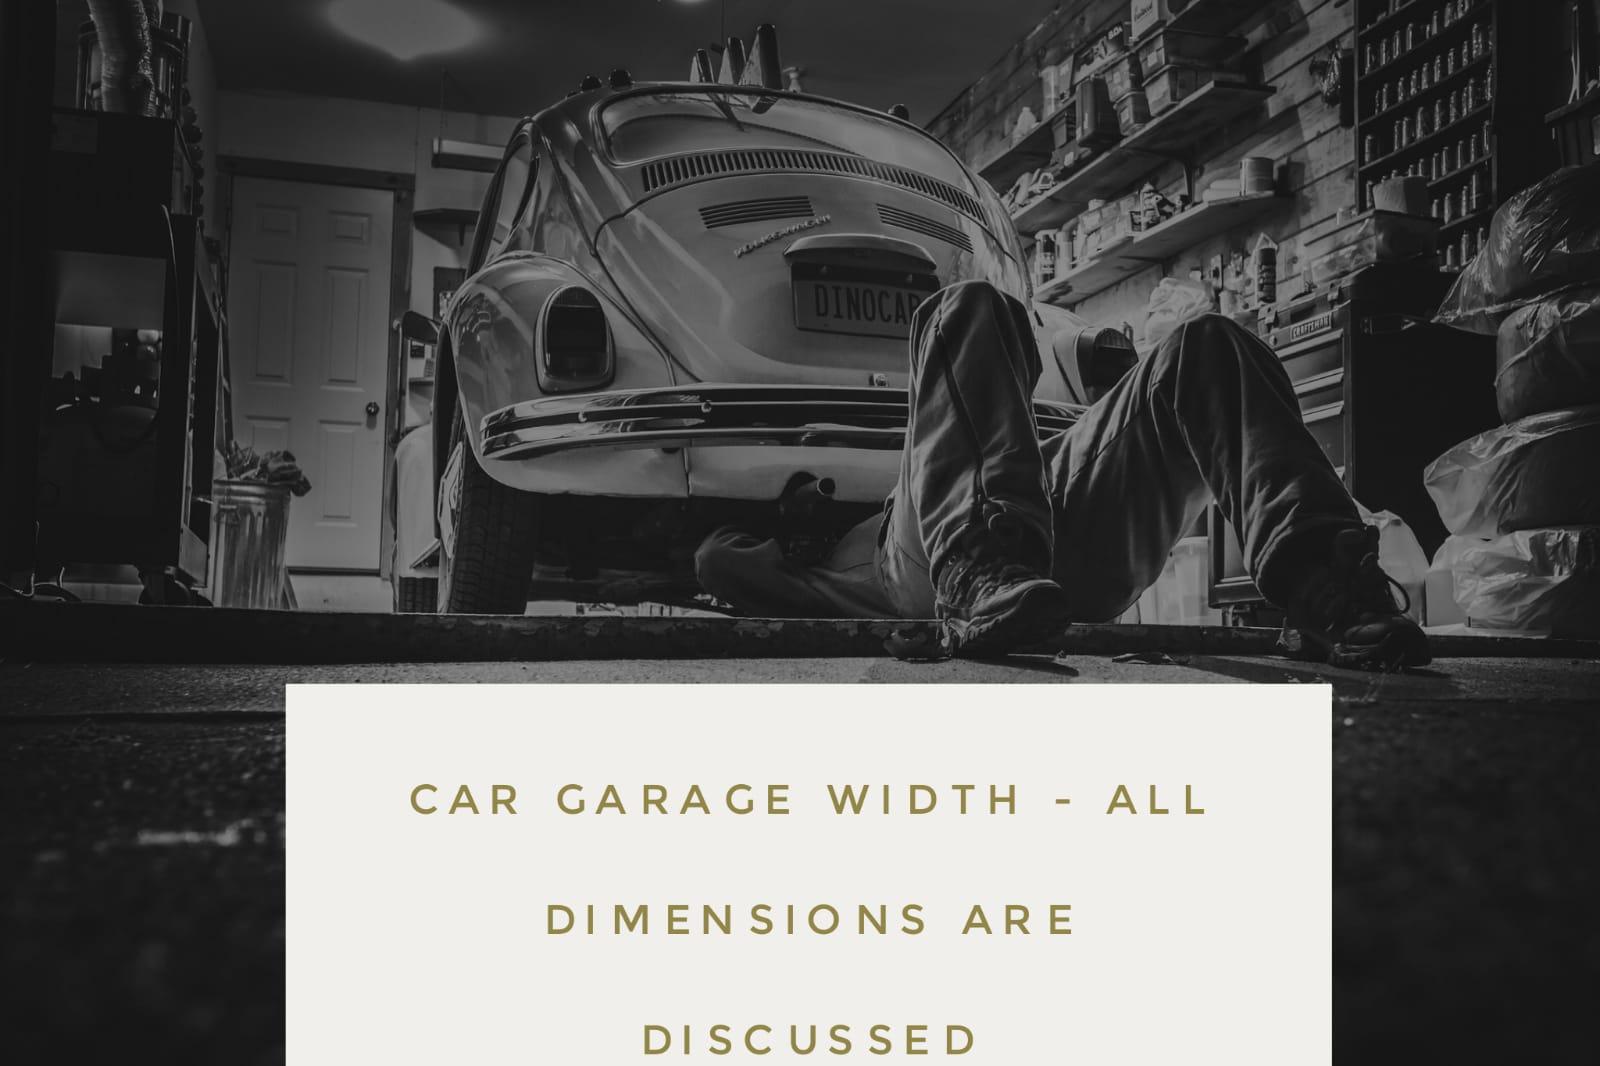 car - Car Garage Width for 1 2 3 car Garage door - FULL Details